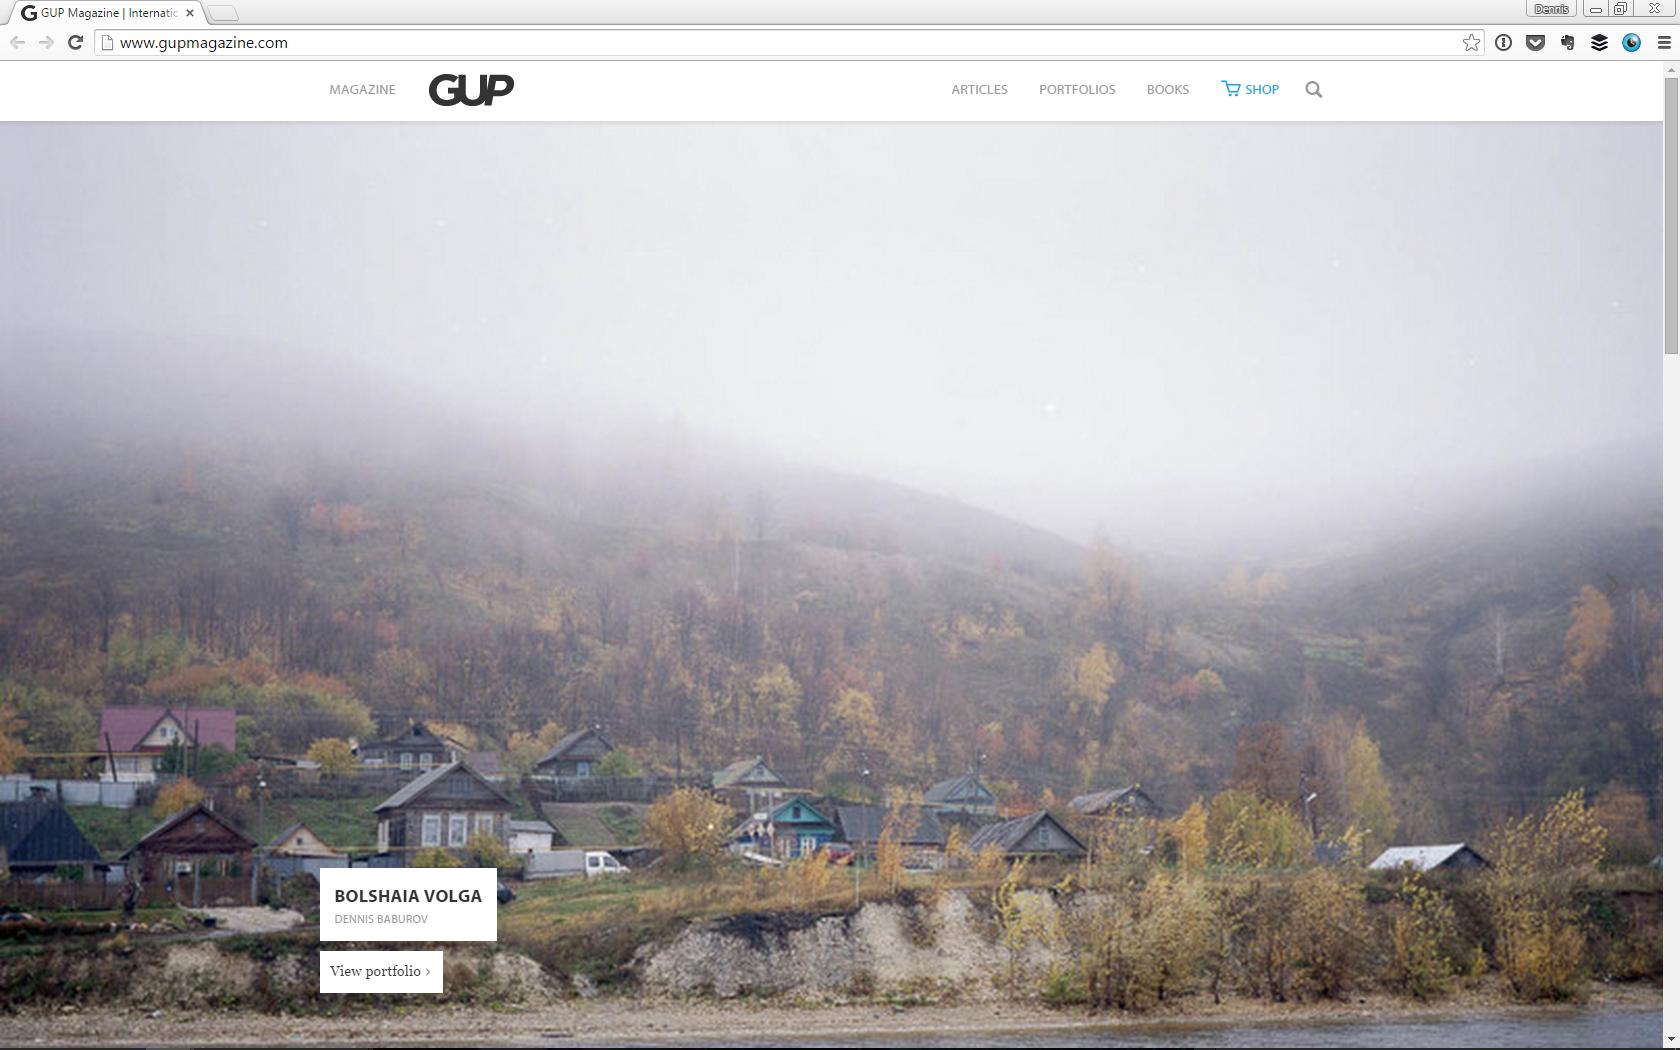 Bolshaia Volga comes to  GUP Magazine .